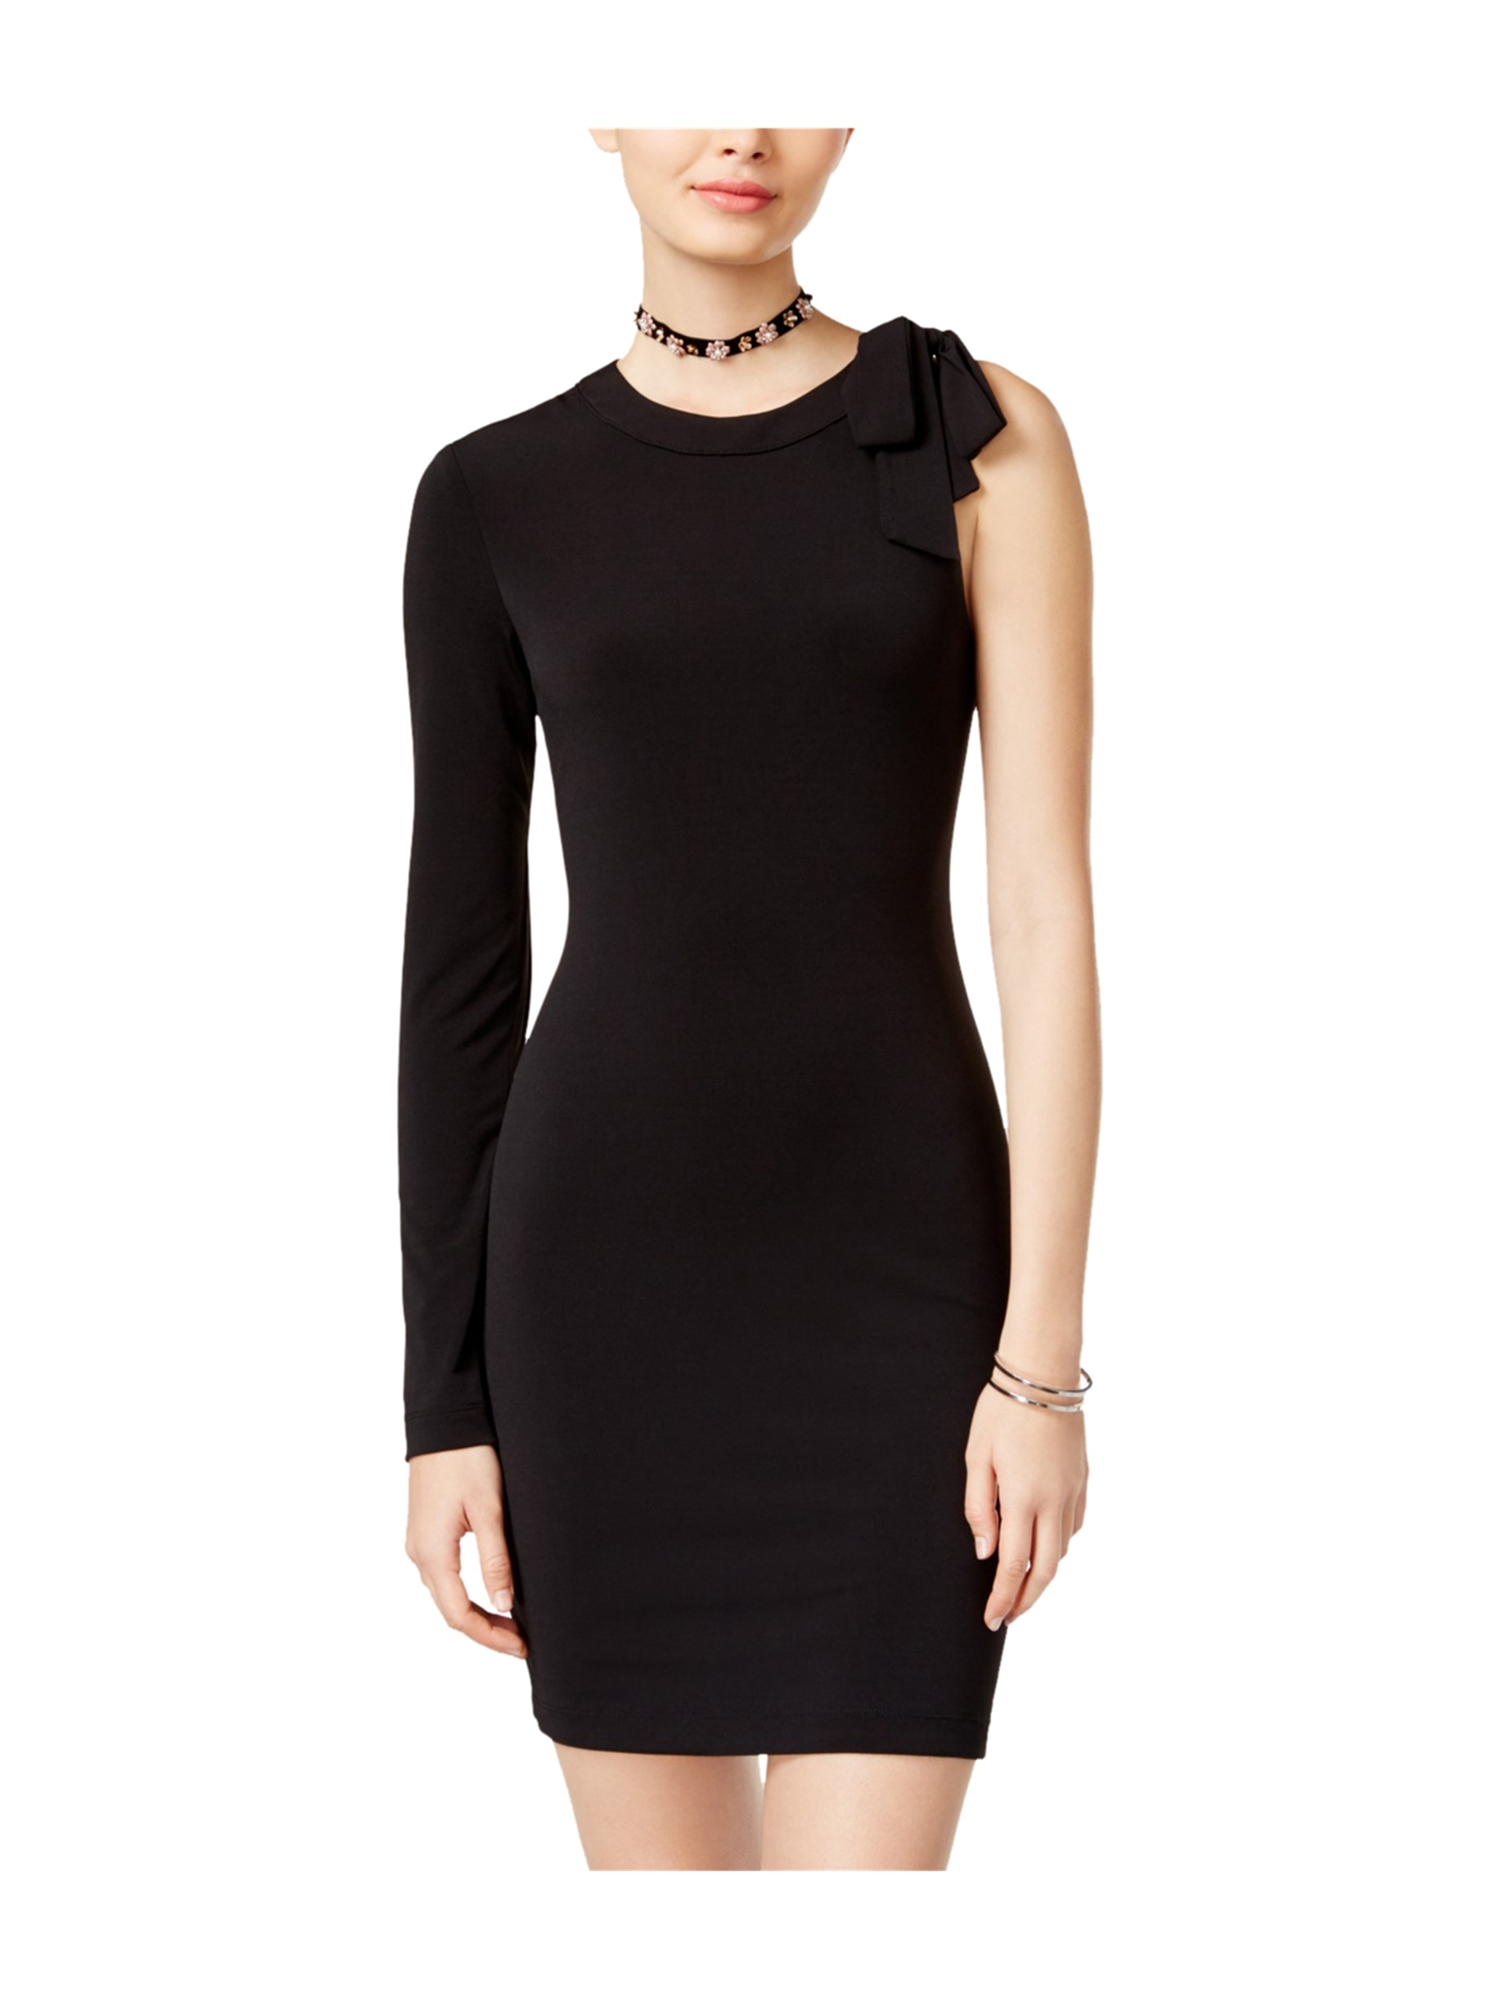 745271428a5 Teeze Me Womens Party Bodycon Dress black 1 - Juniors